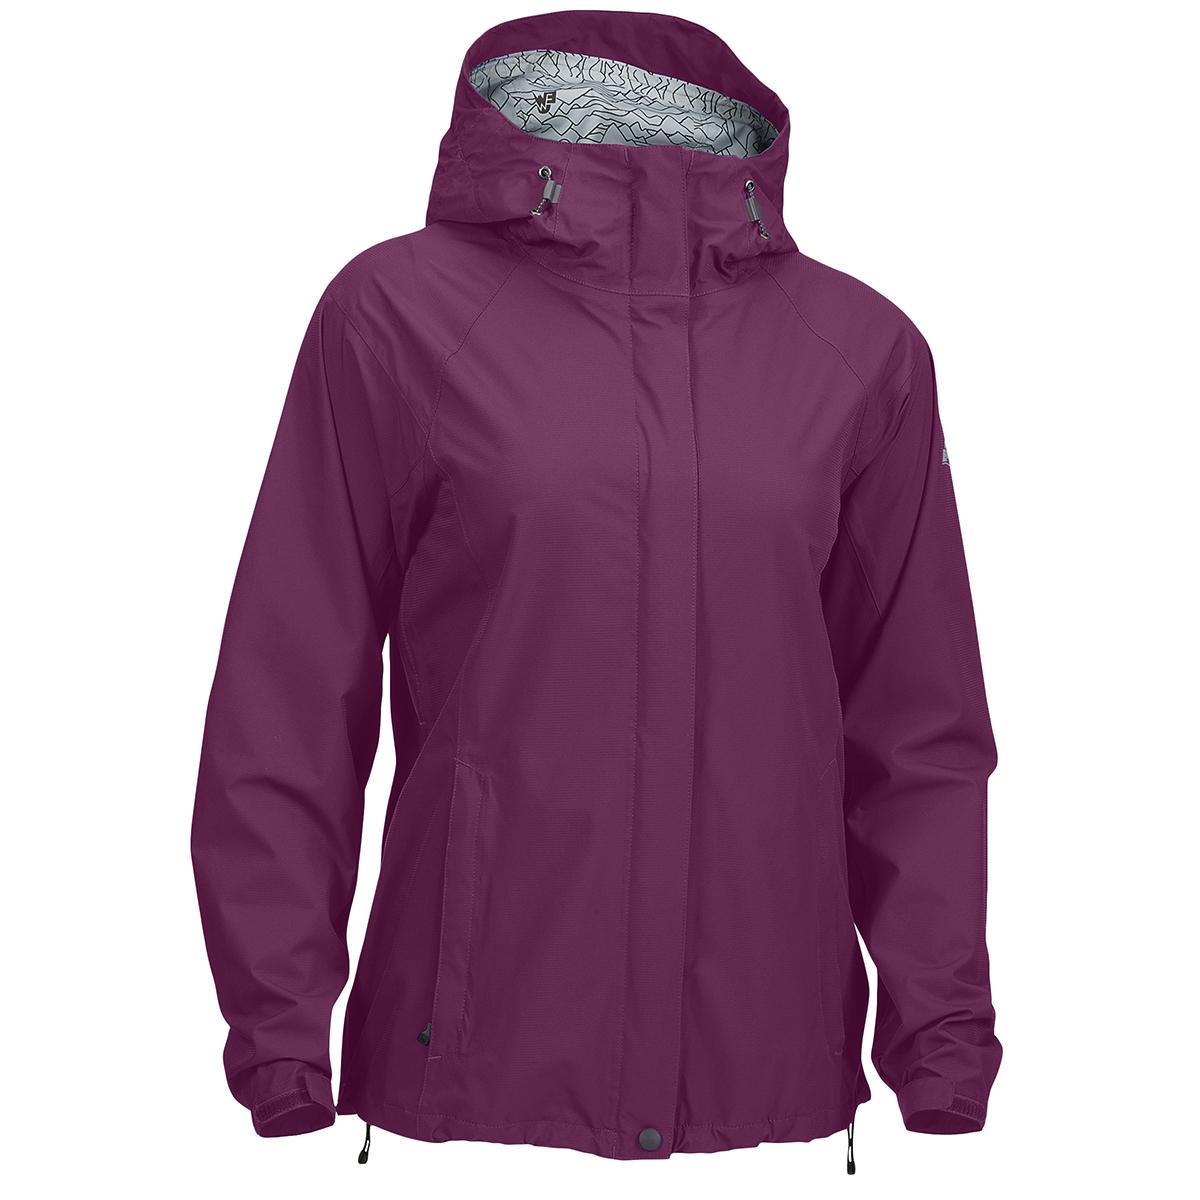 Ems Women's Thunderhead Peak Rain Jacket - Purple, S